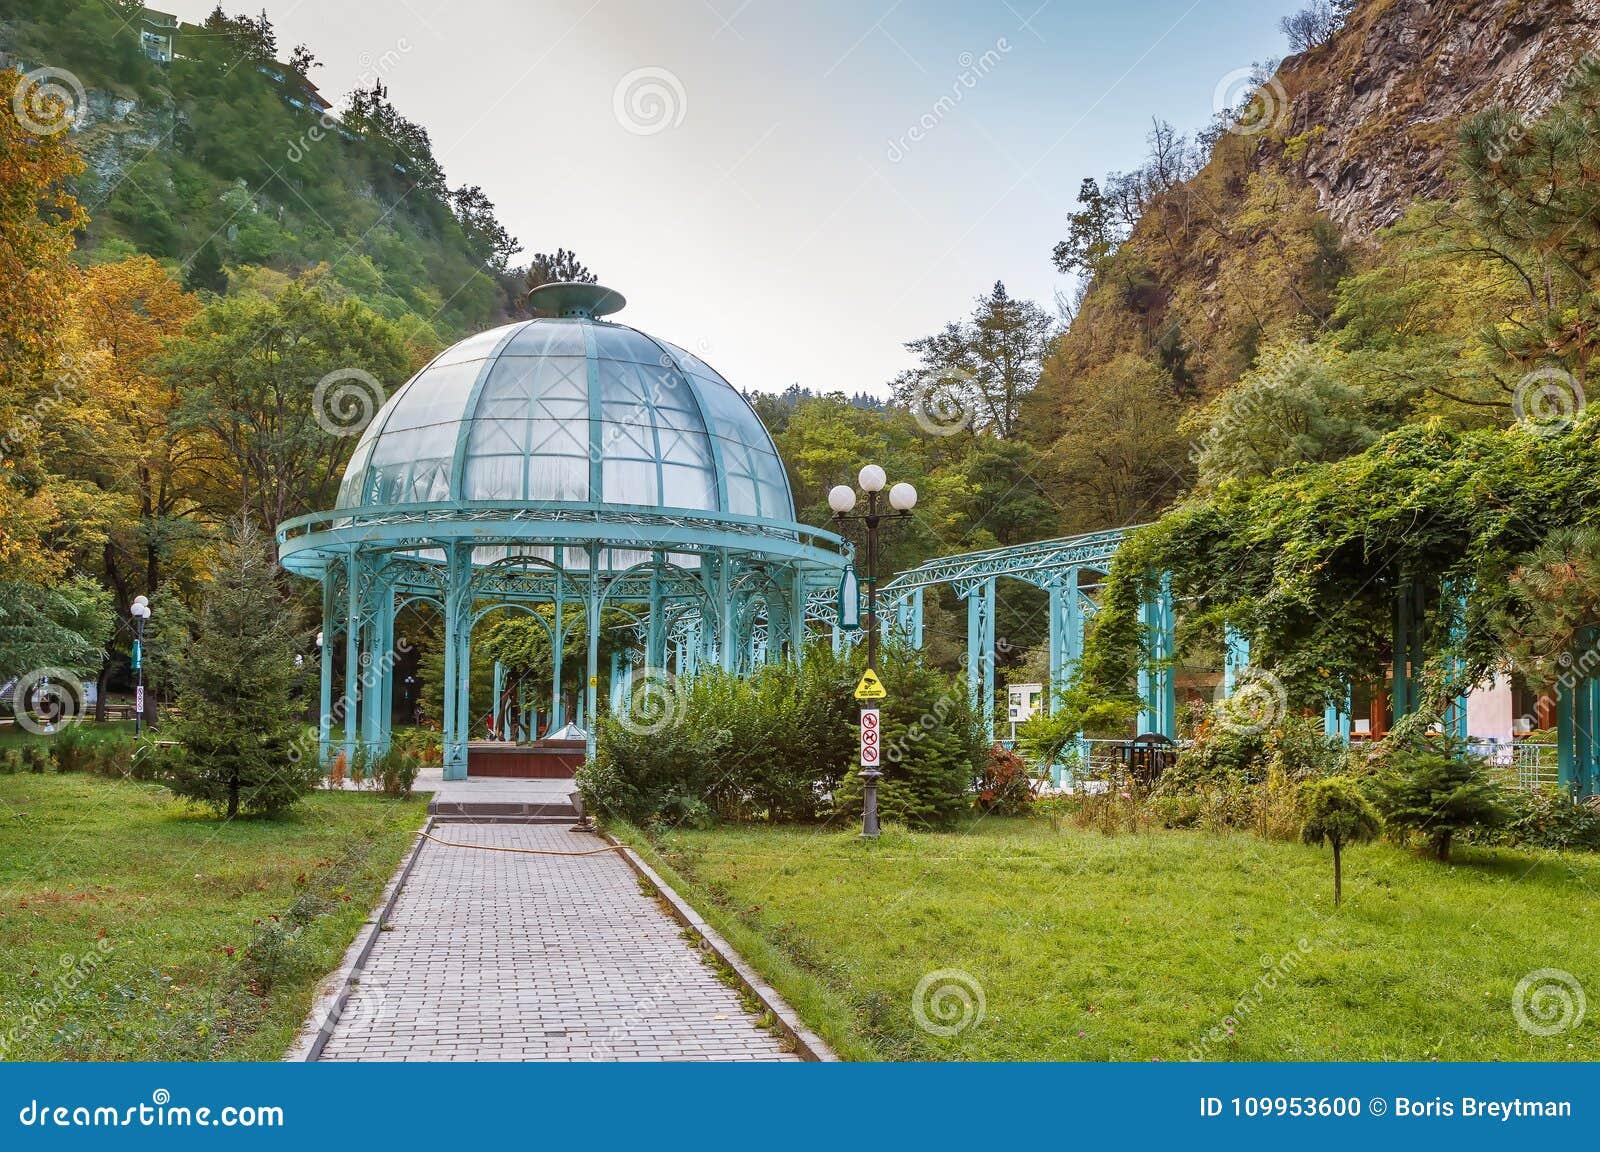 Pavilion in Borjomi central par, Georgia